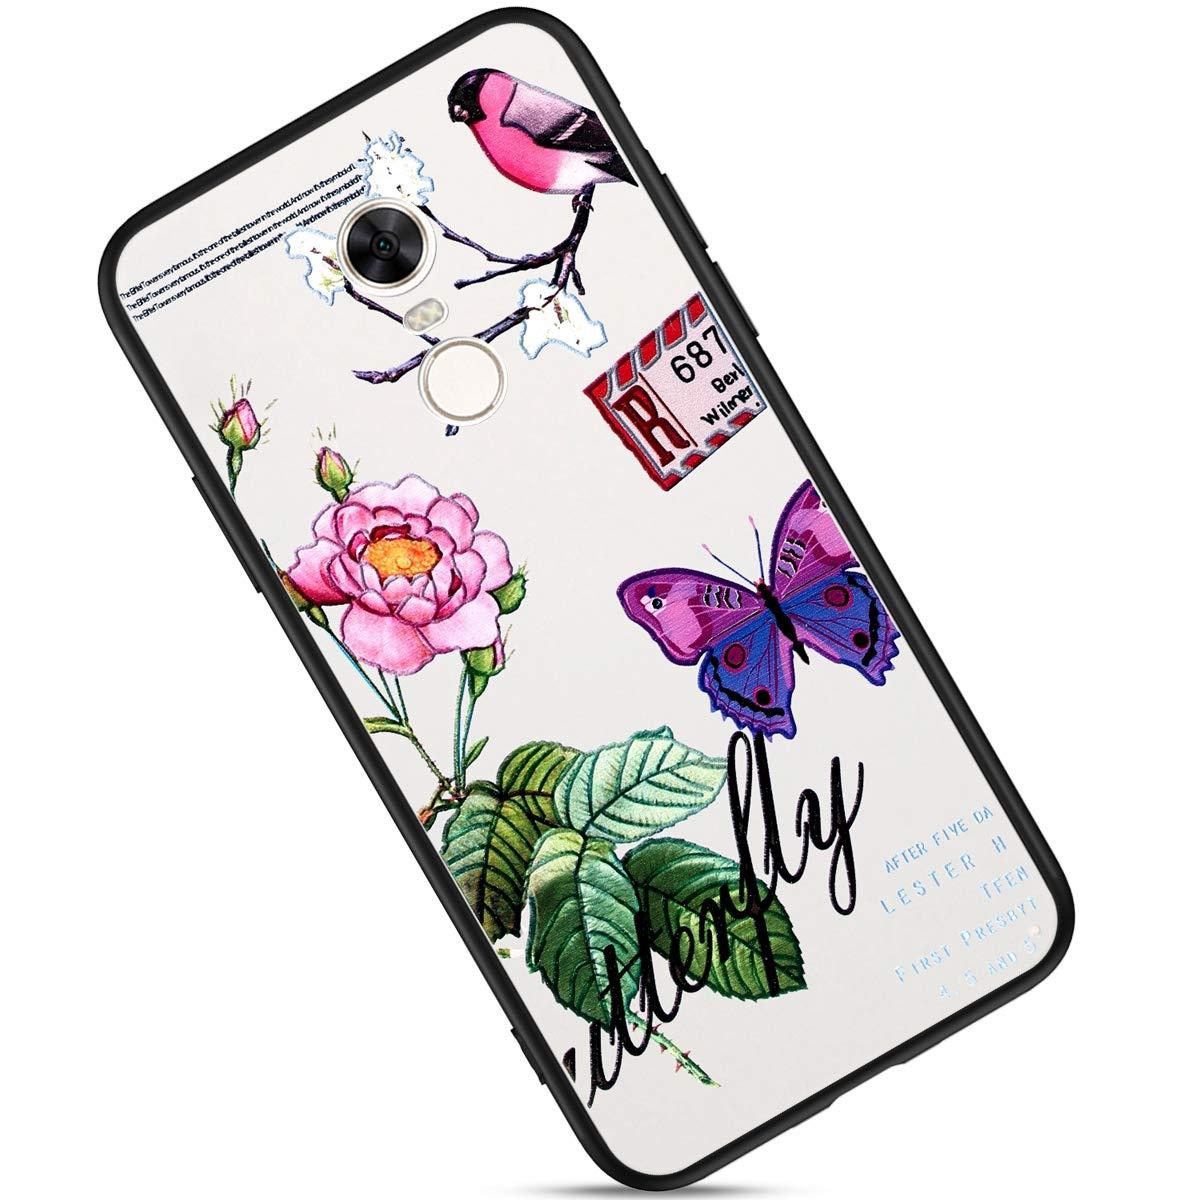 Felfy Kompatibel mit Redmi Note 4X H/ülle Silikon Handyh/ülle Ultra D/ünn Gel TPU /& PC Hybrid Schlanke mit Elegant Muster Anti-Scratch Kratzfest Handy H/ülle Tasche Bumper Case Backcover